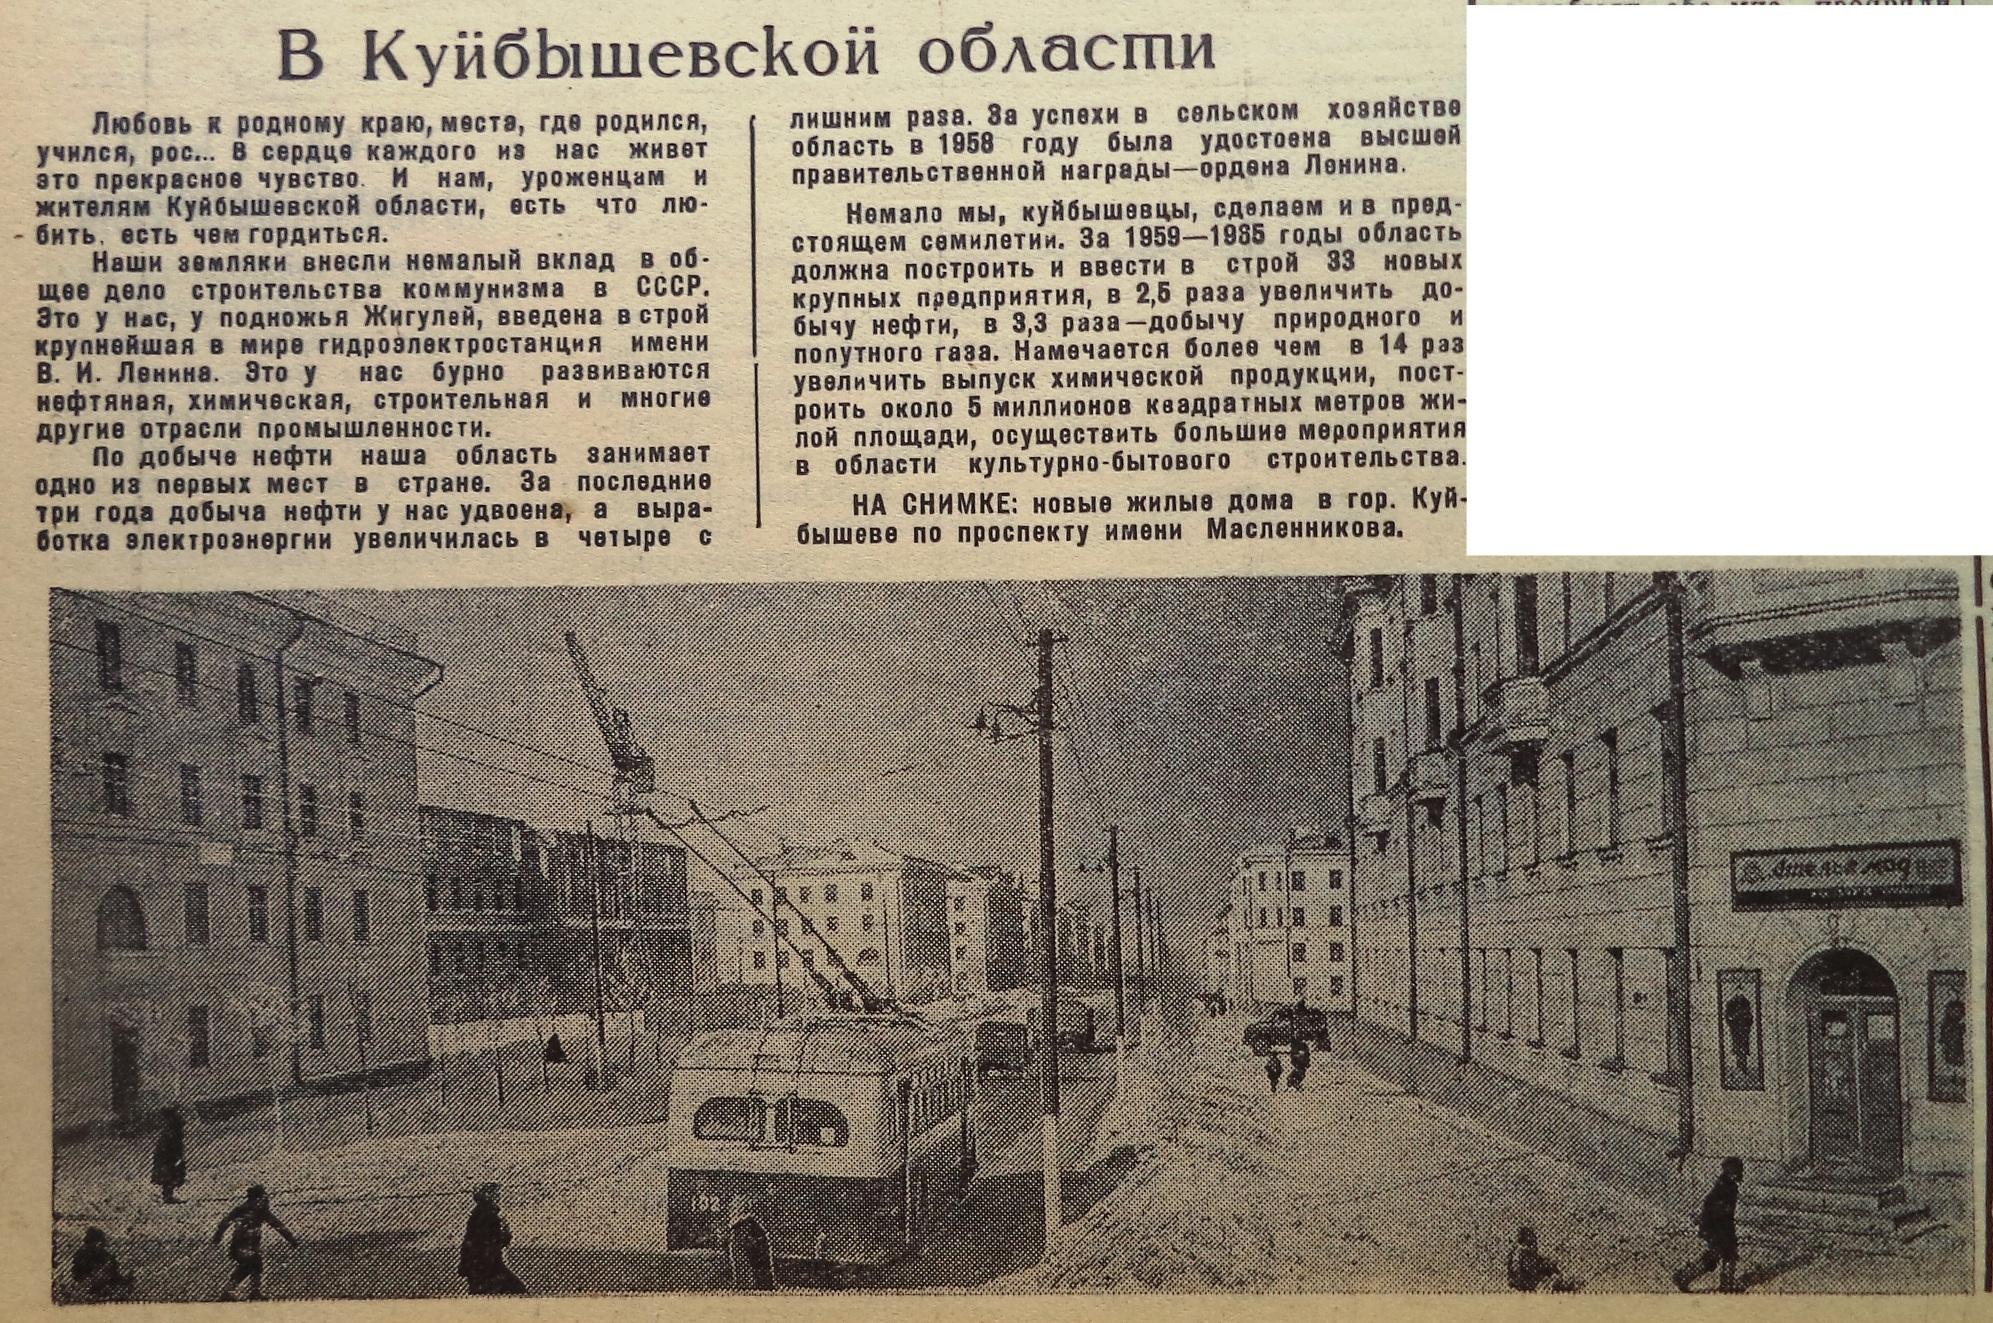 ФОТО-Масленникова-33-Знамя Труда-1959-8 апреля